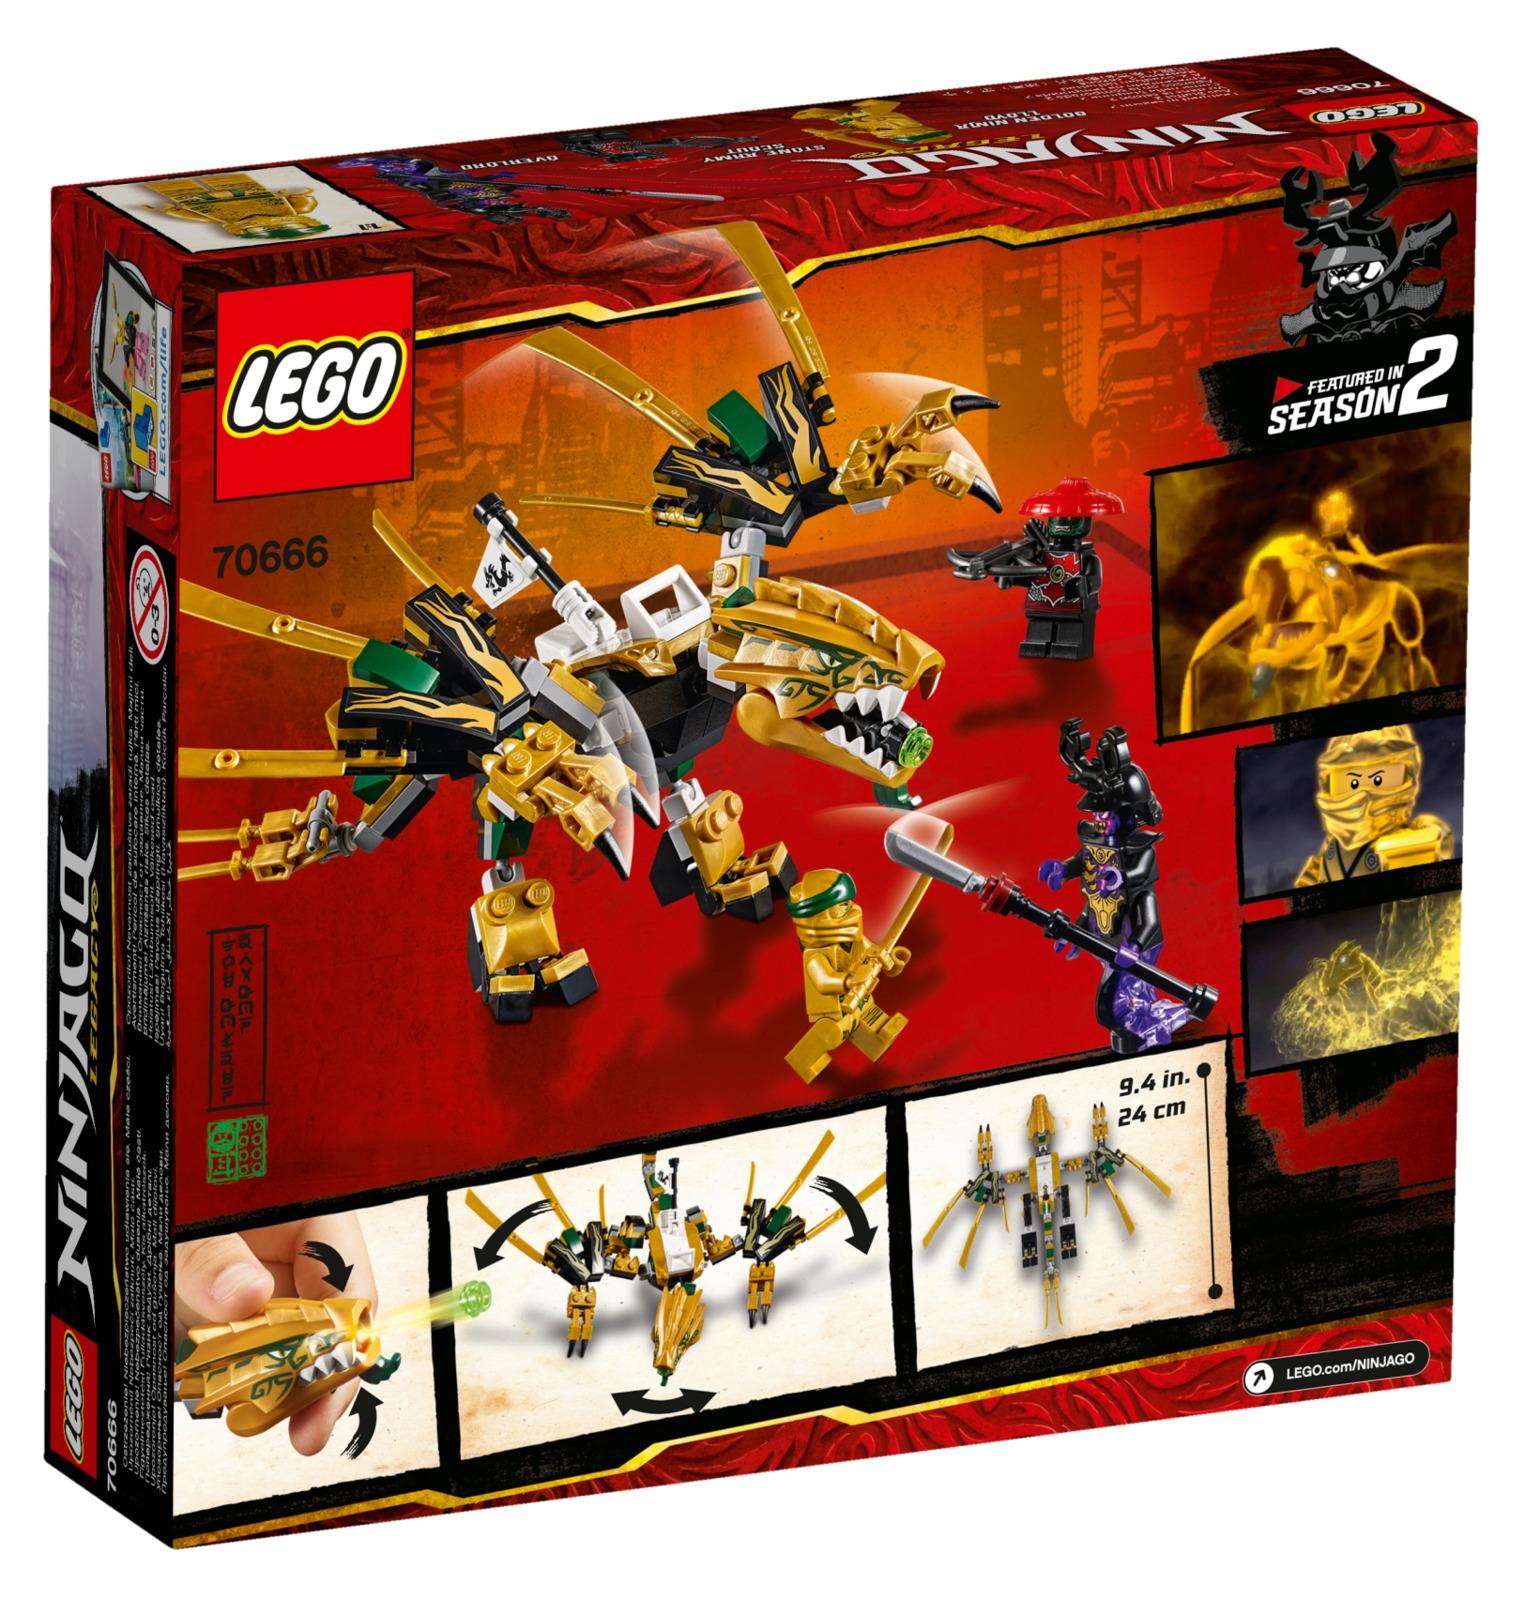 LEGO Ninjago - The Golden Dragon (70666) image